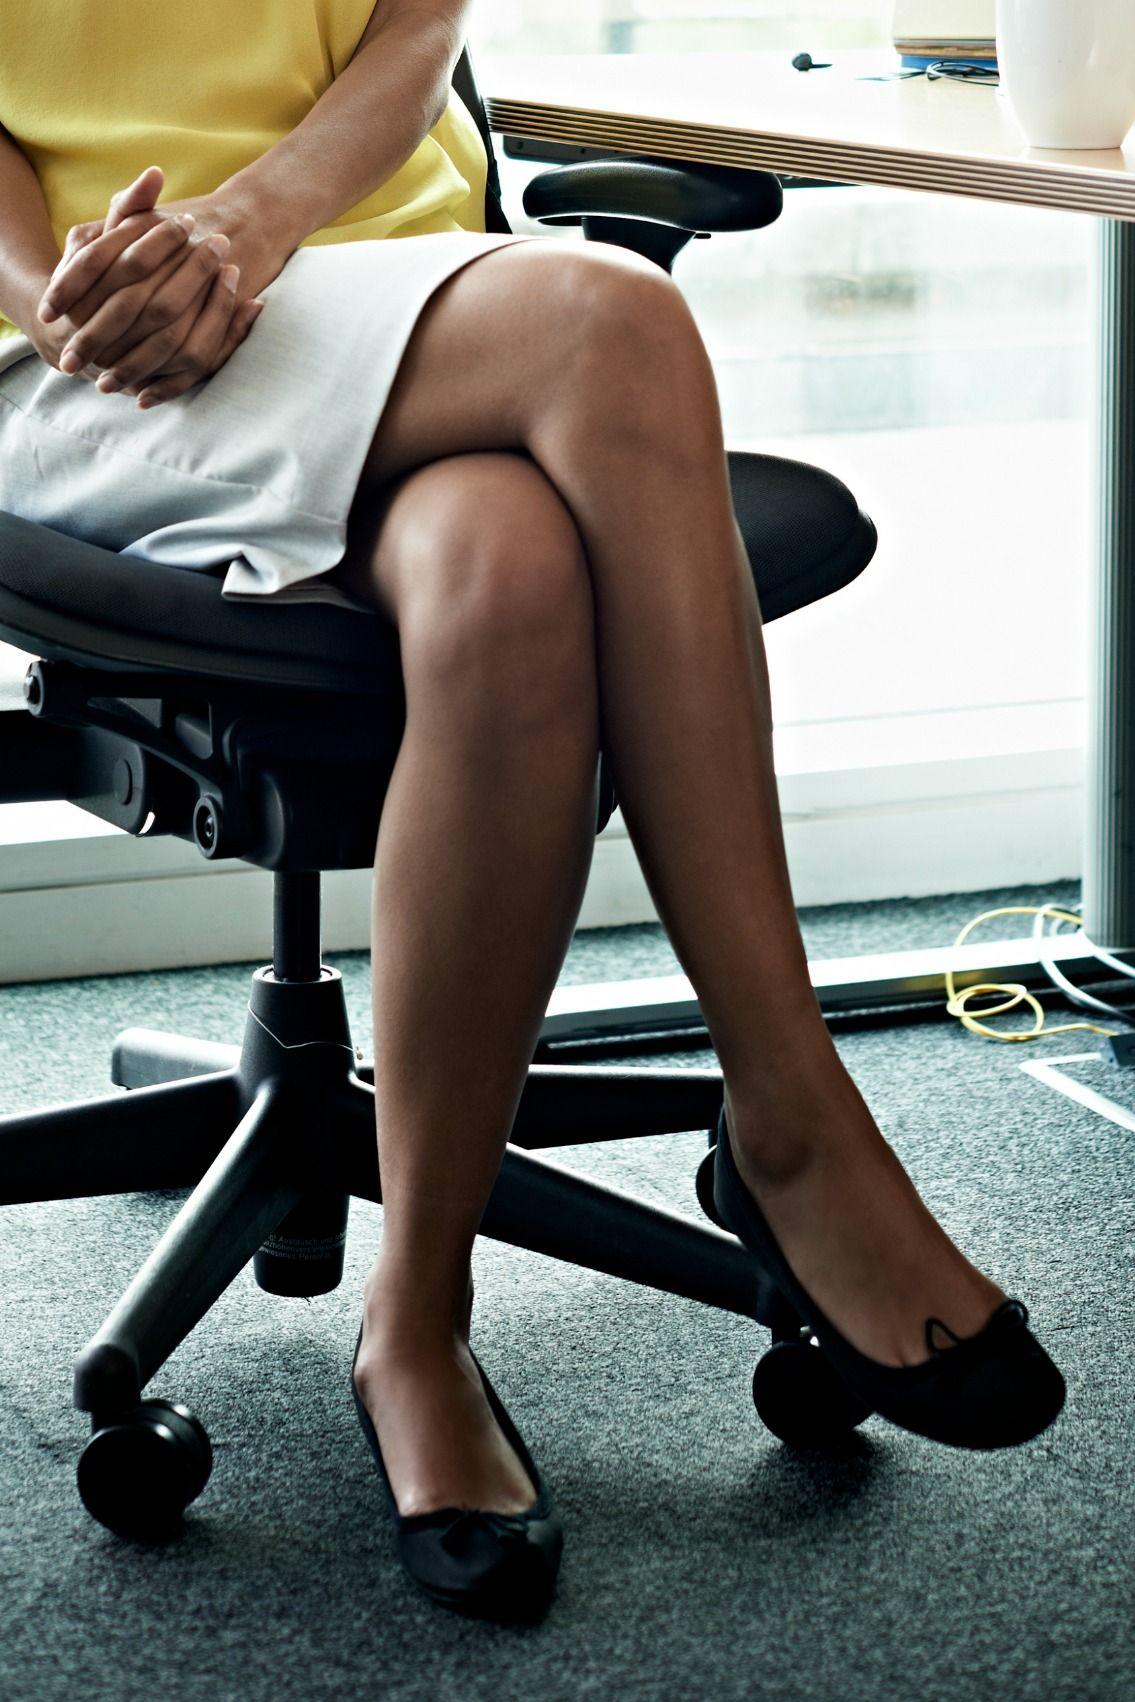 Sitting health tips